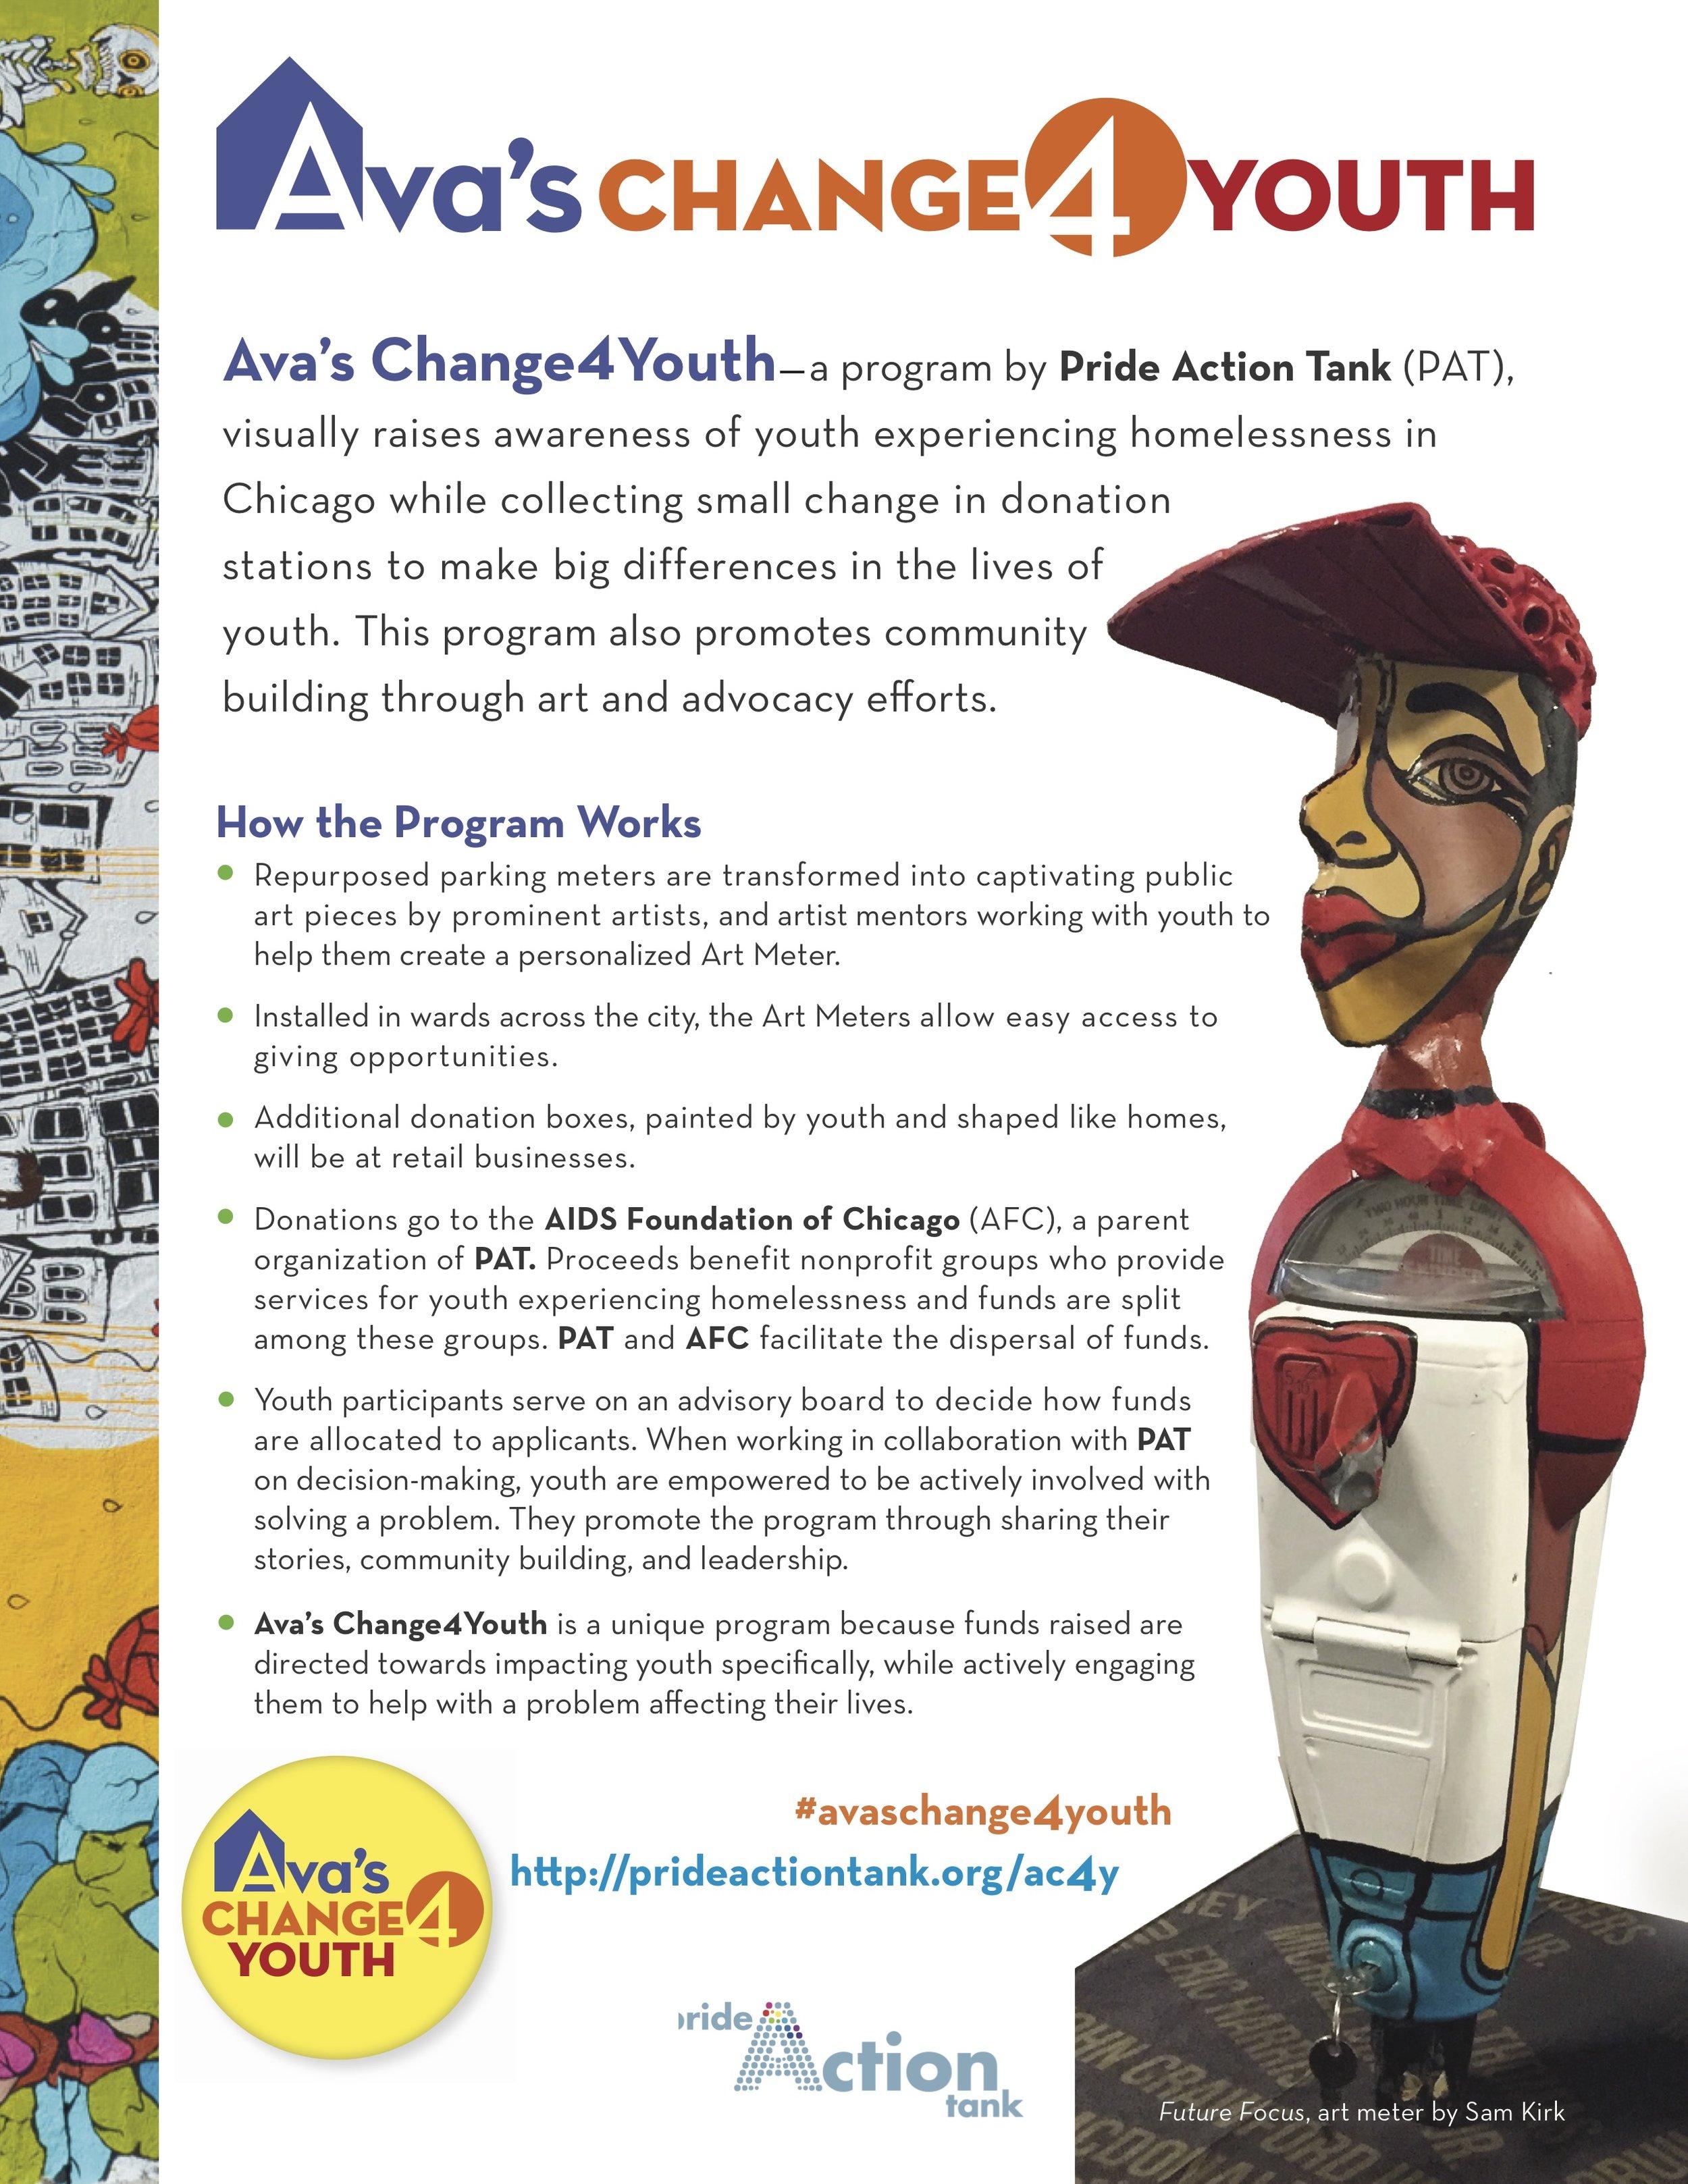 Avas-Change4Youth-Flyer_withAvaSam.jpg